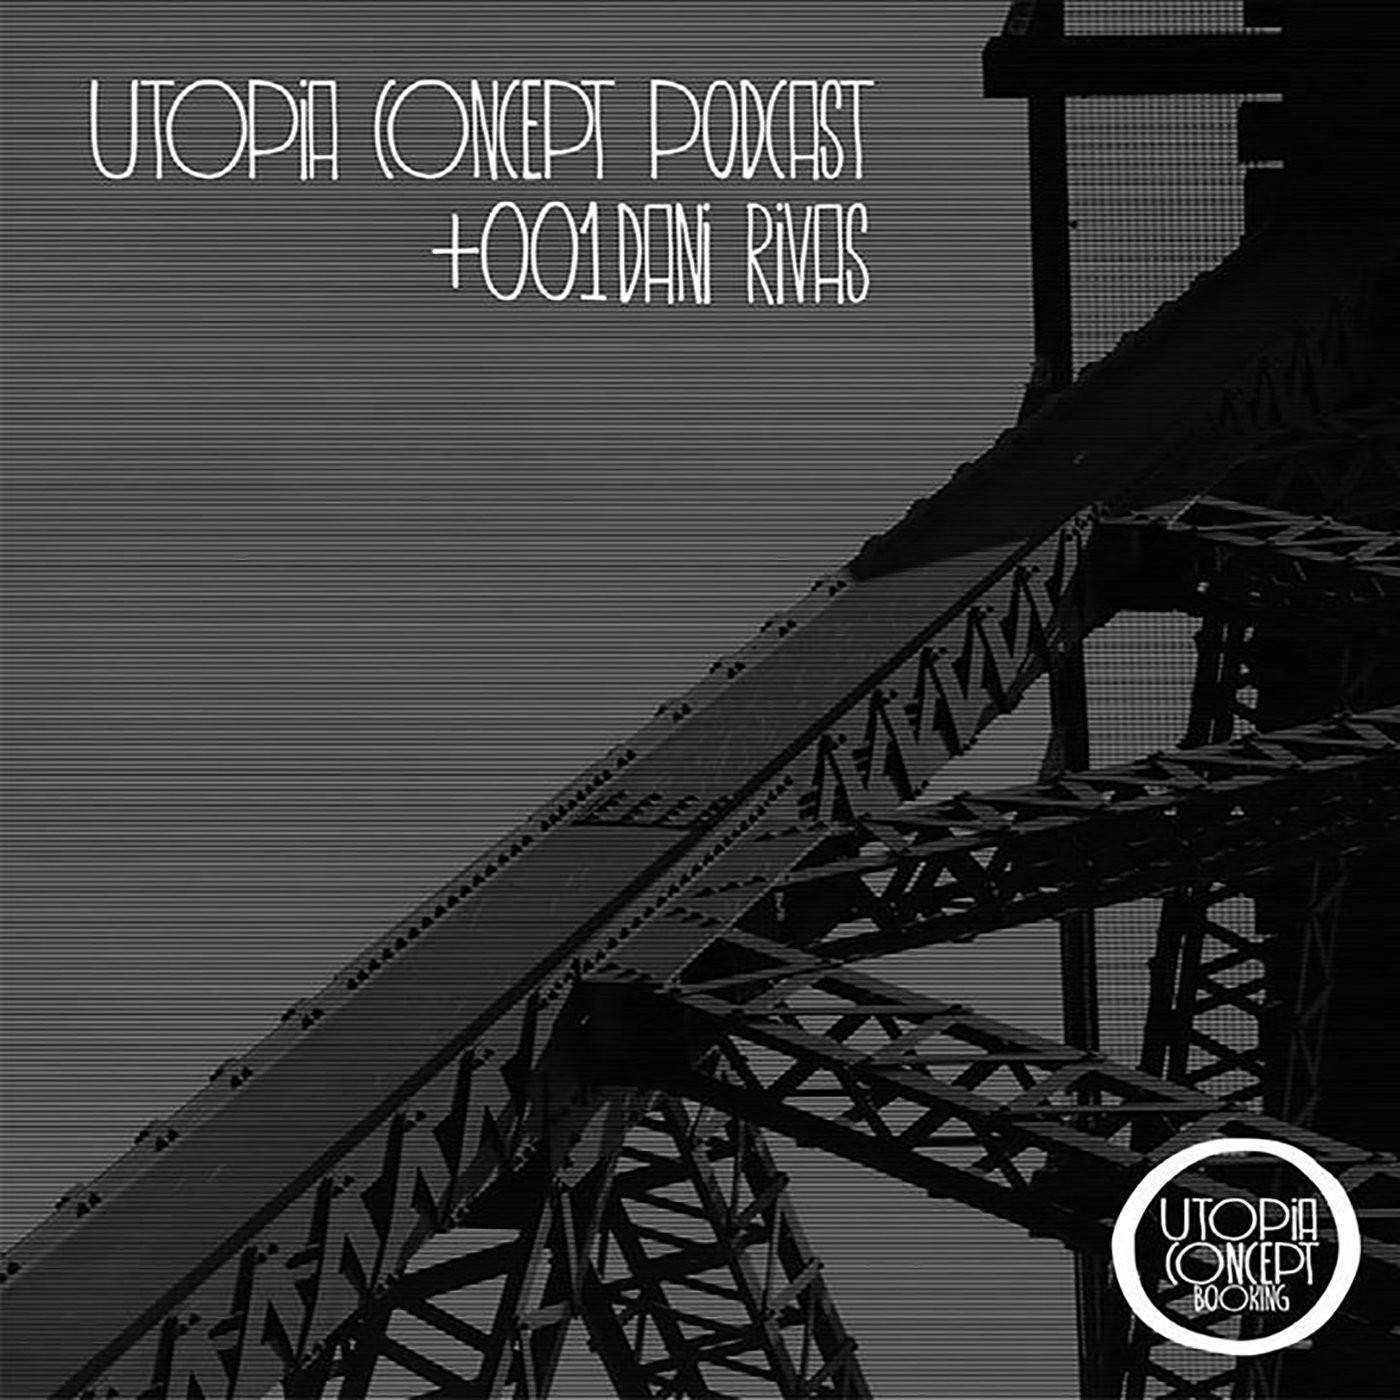 <![CDATA[Utopia Concept podcast 002]]>